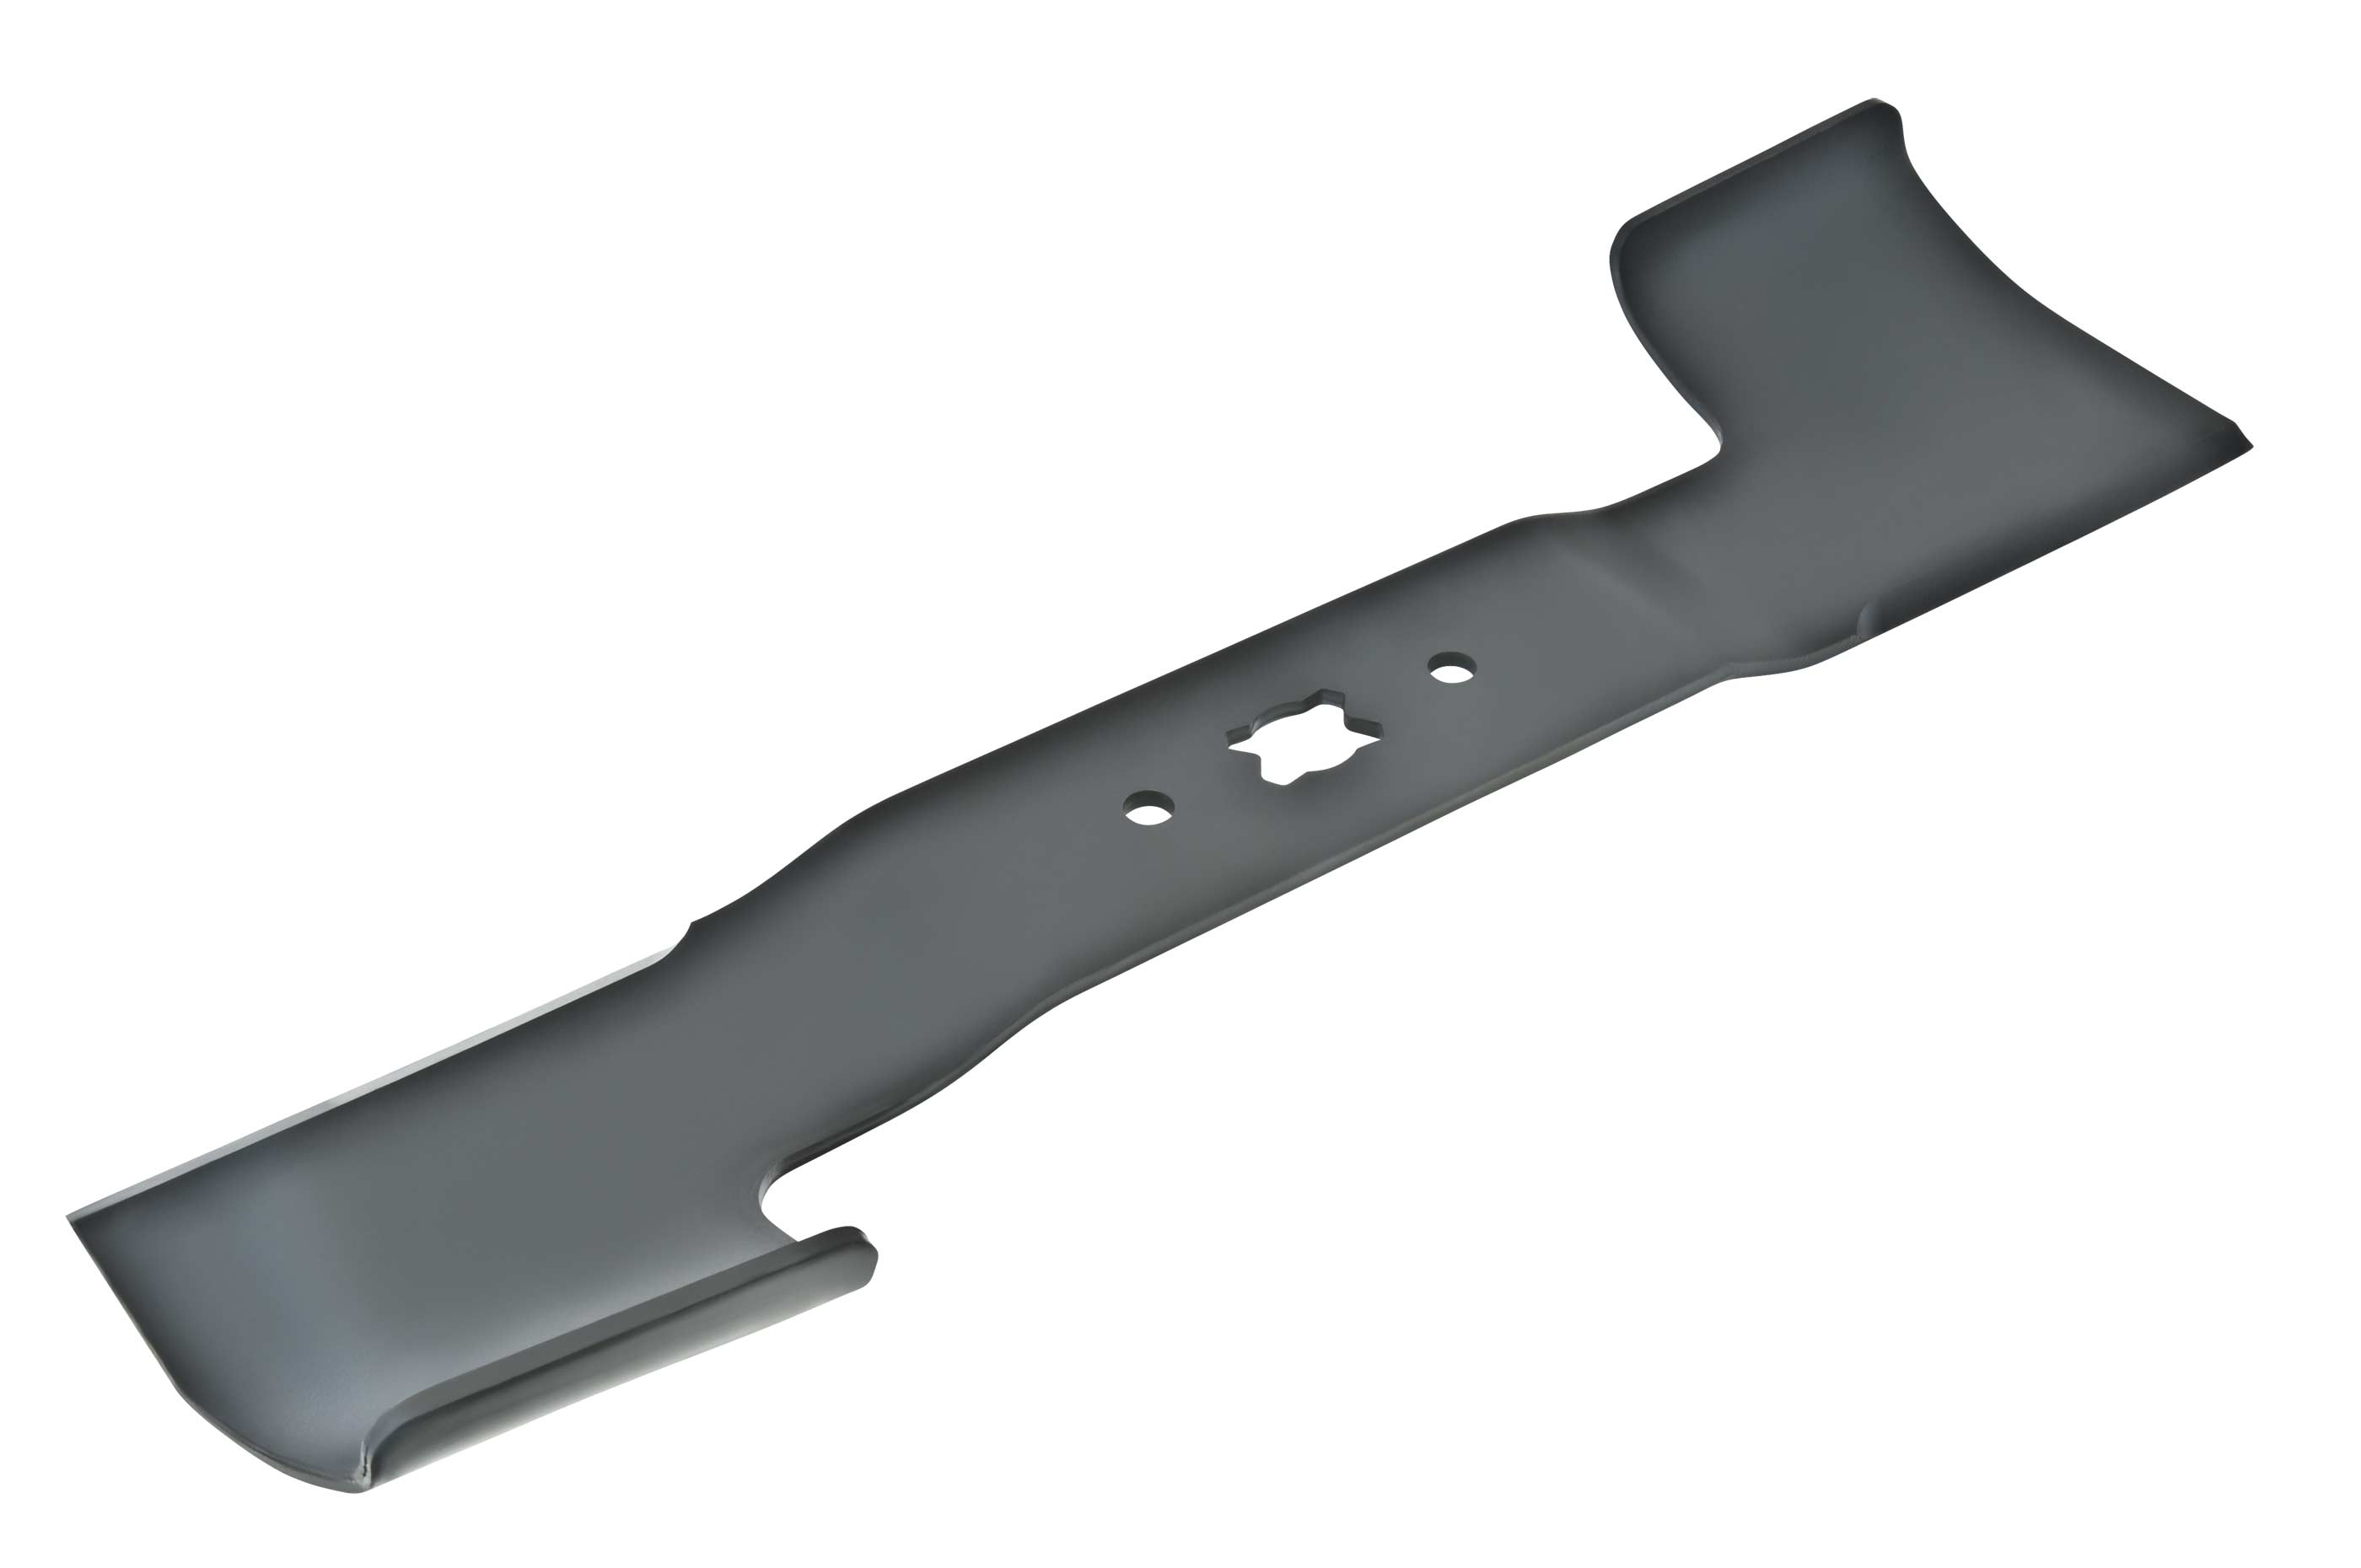 MTD Ersatzmesser für MTD Benzin Rasenmäher 42 PO/SPO 42cm Bild 1